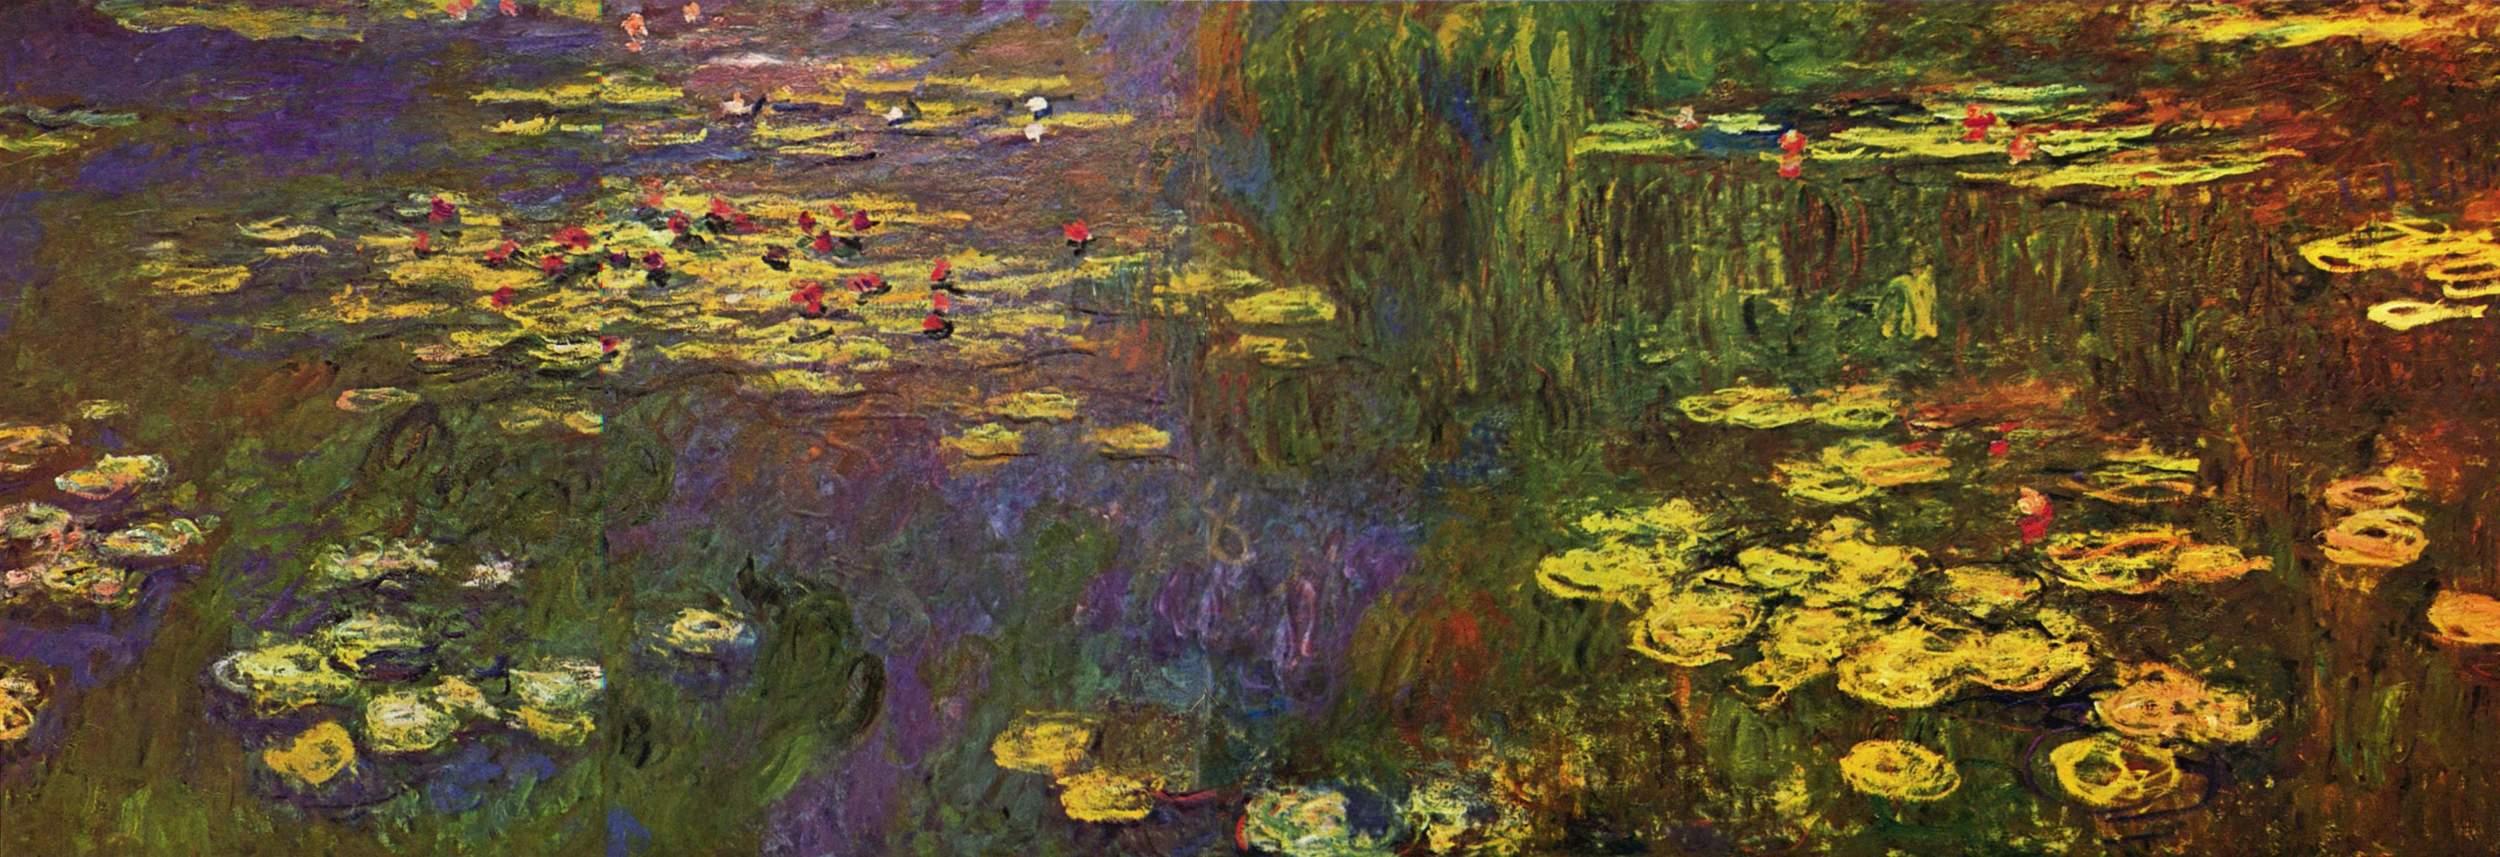 Personal branding is like Monet's  Water Lilies .